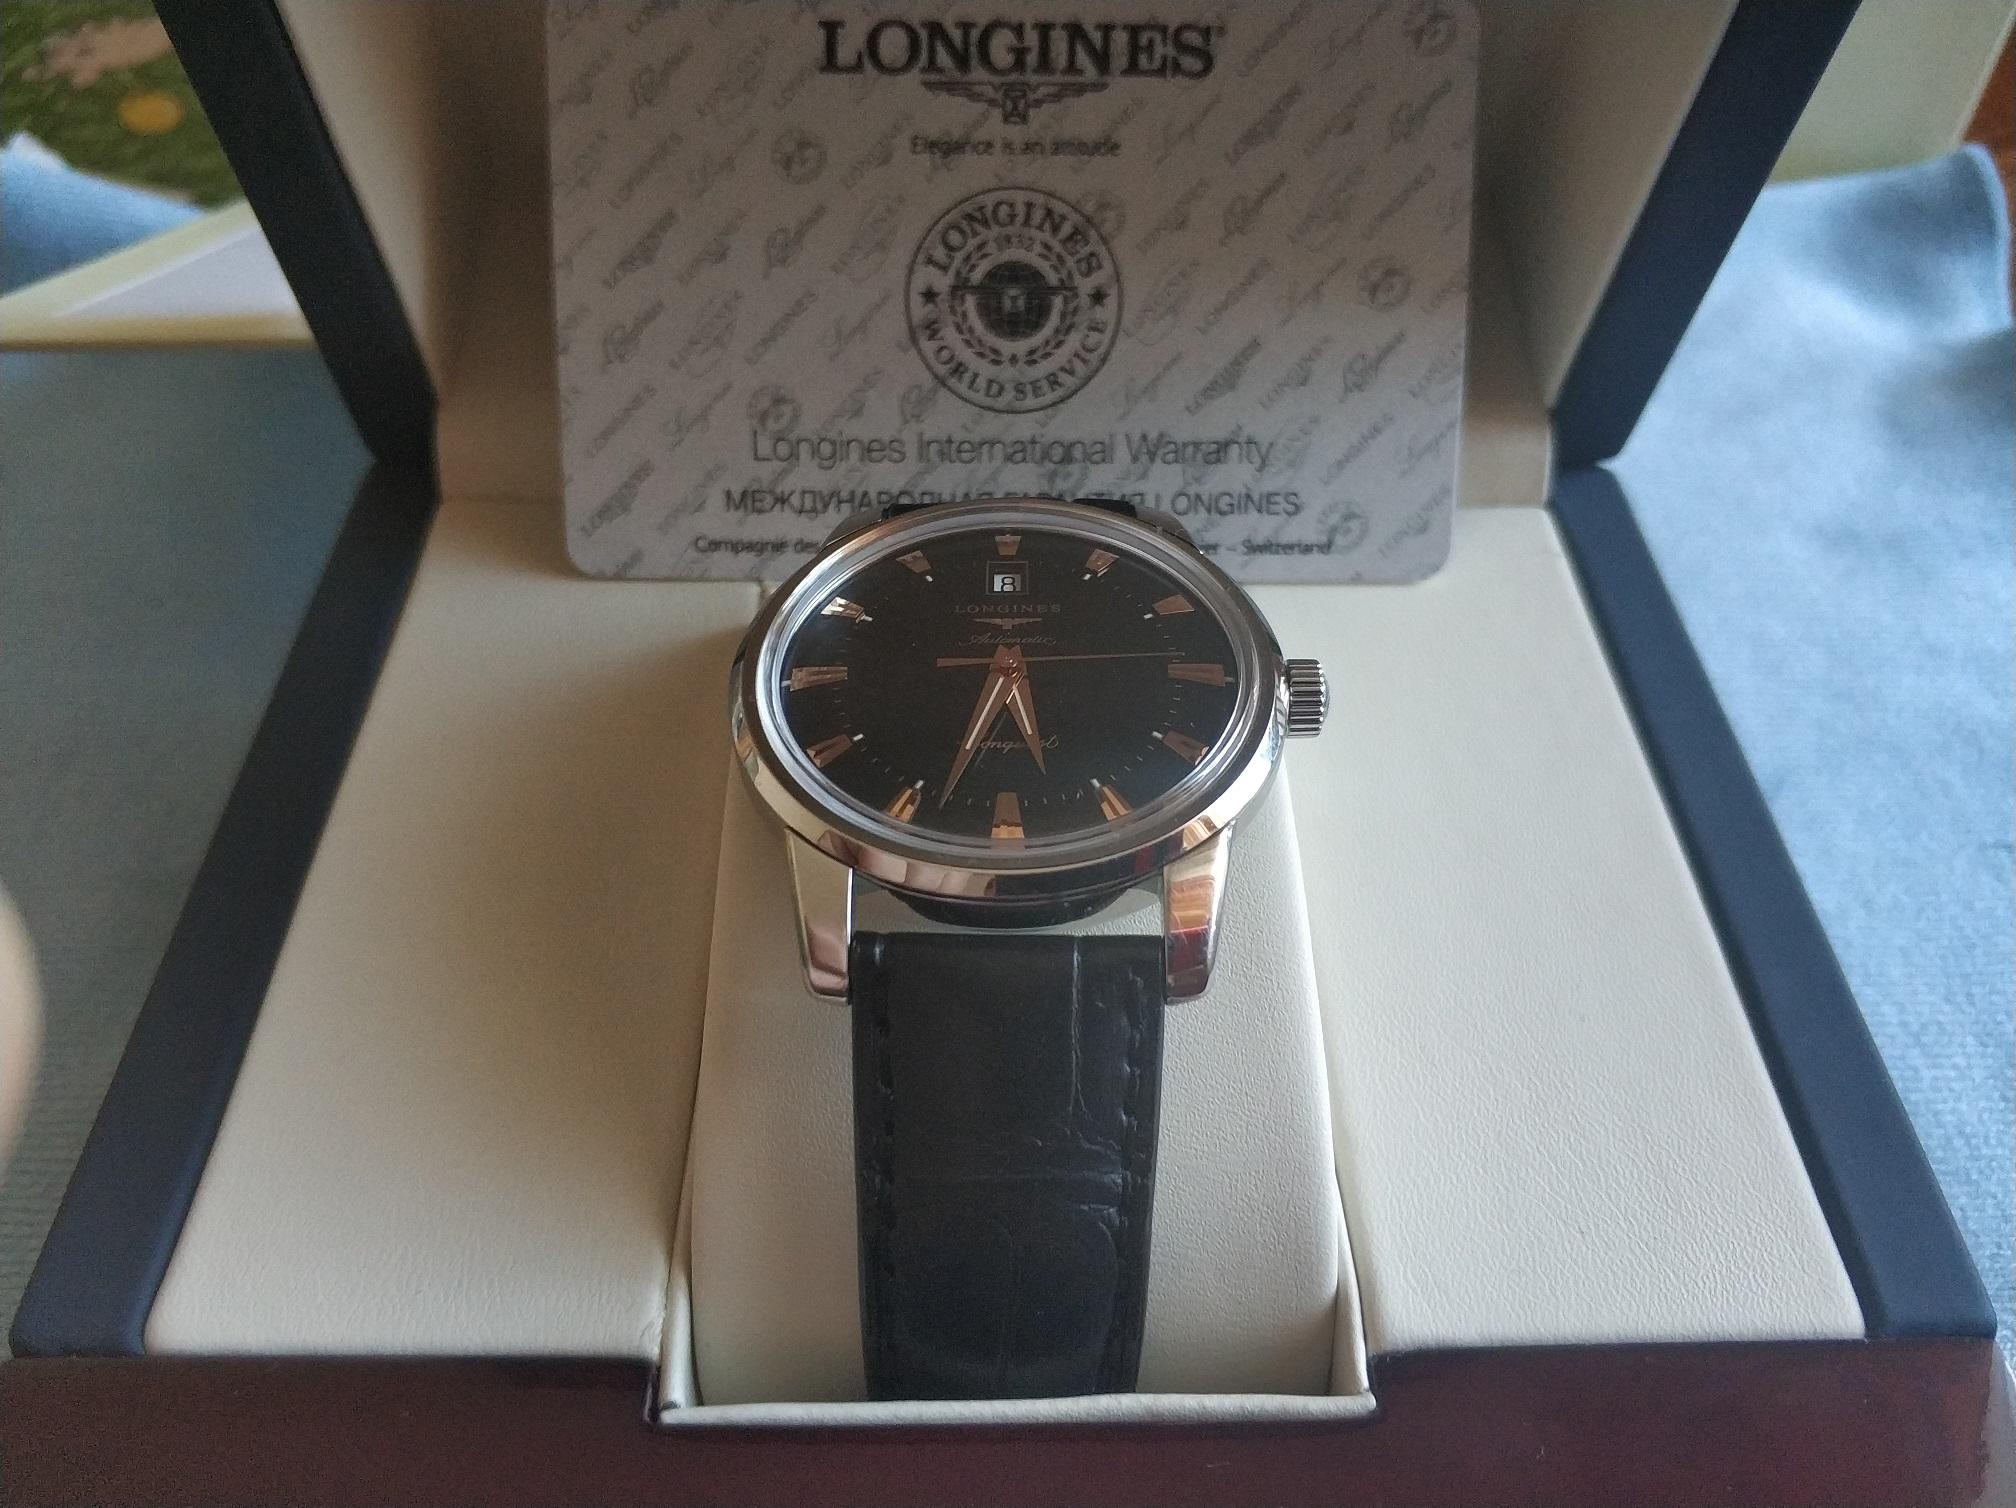 часы Longines Longines Haritage  - L1.645.4.52.9